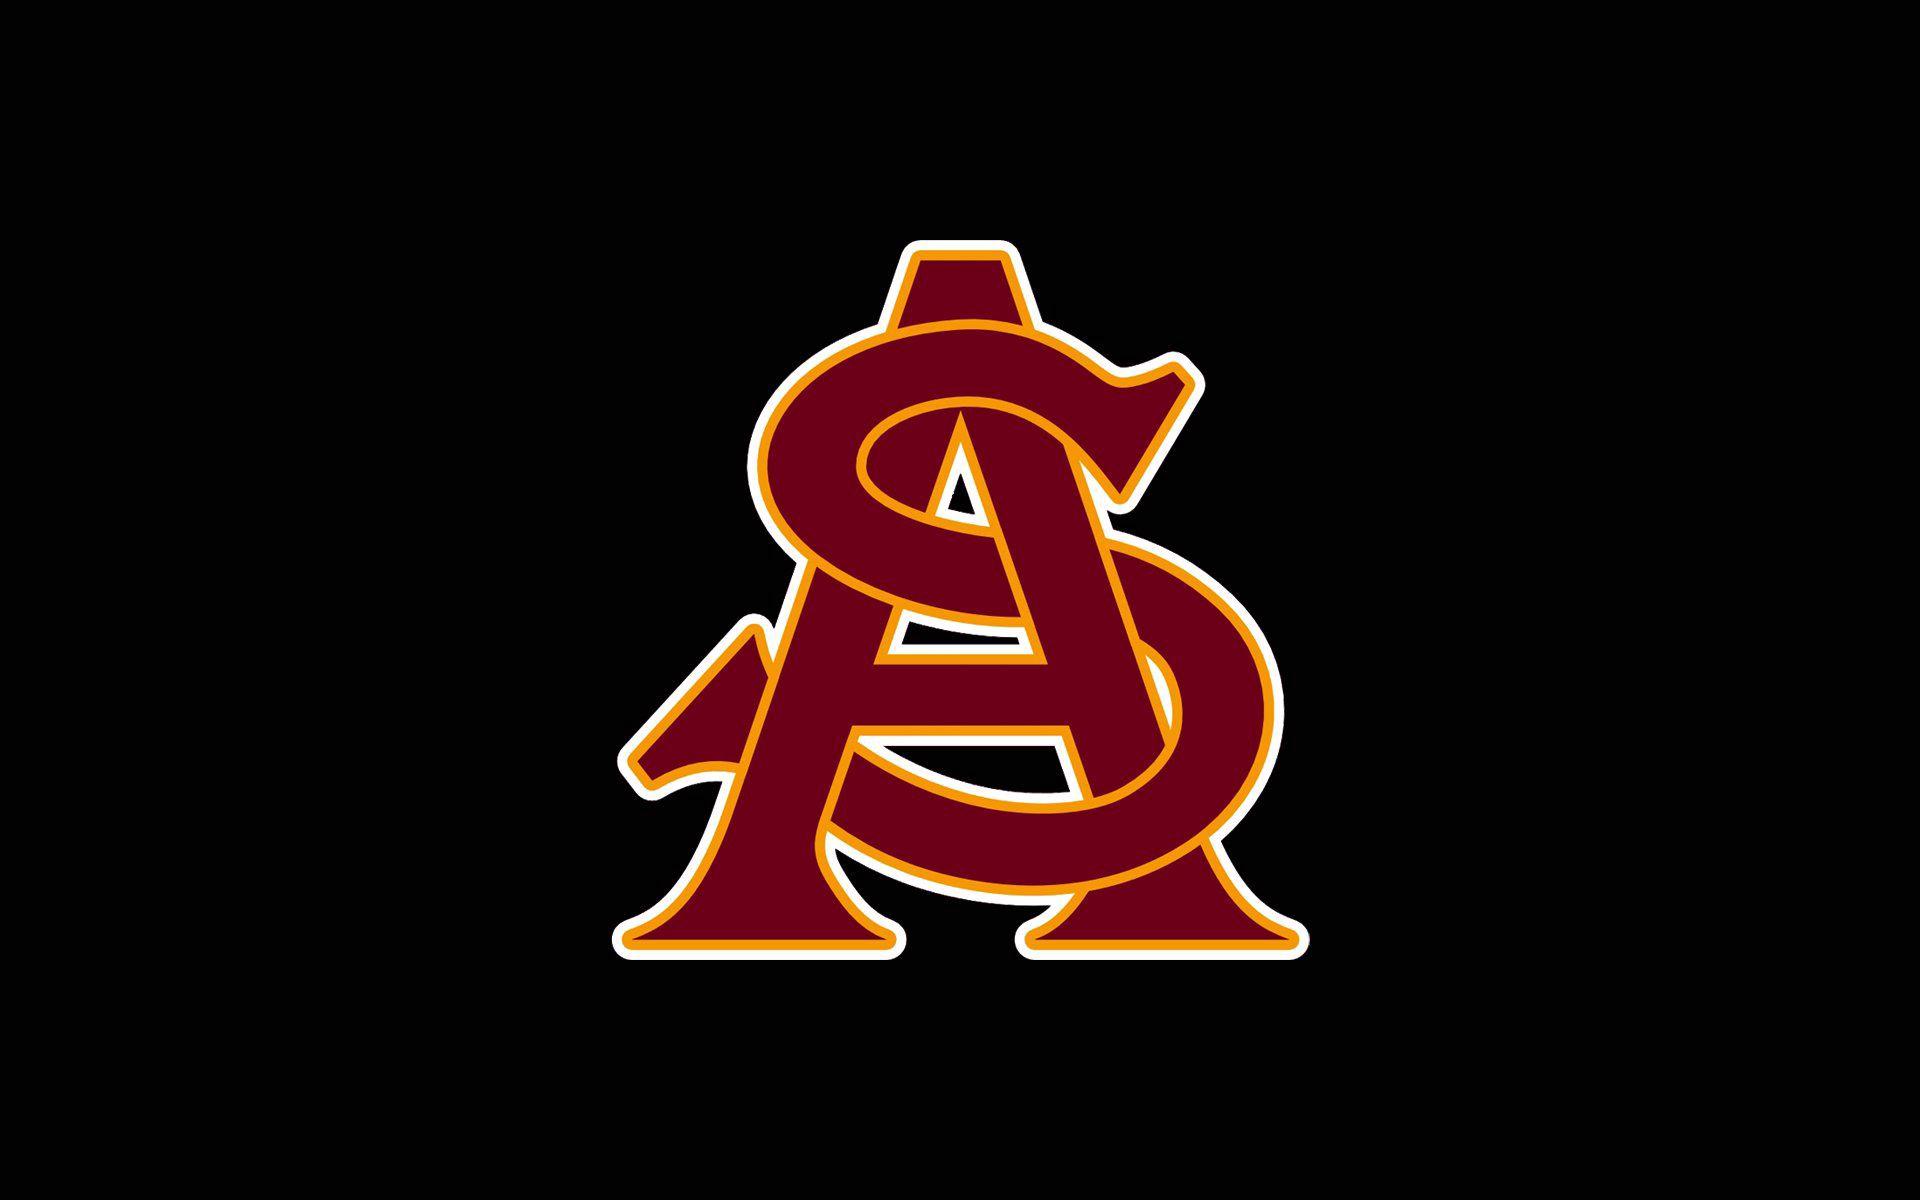 102143 скачать обои Спорт, Arizona State, Sun Devils Football, Логотип - заставки и картинки бесплатно